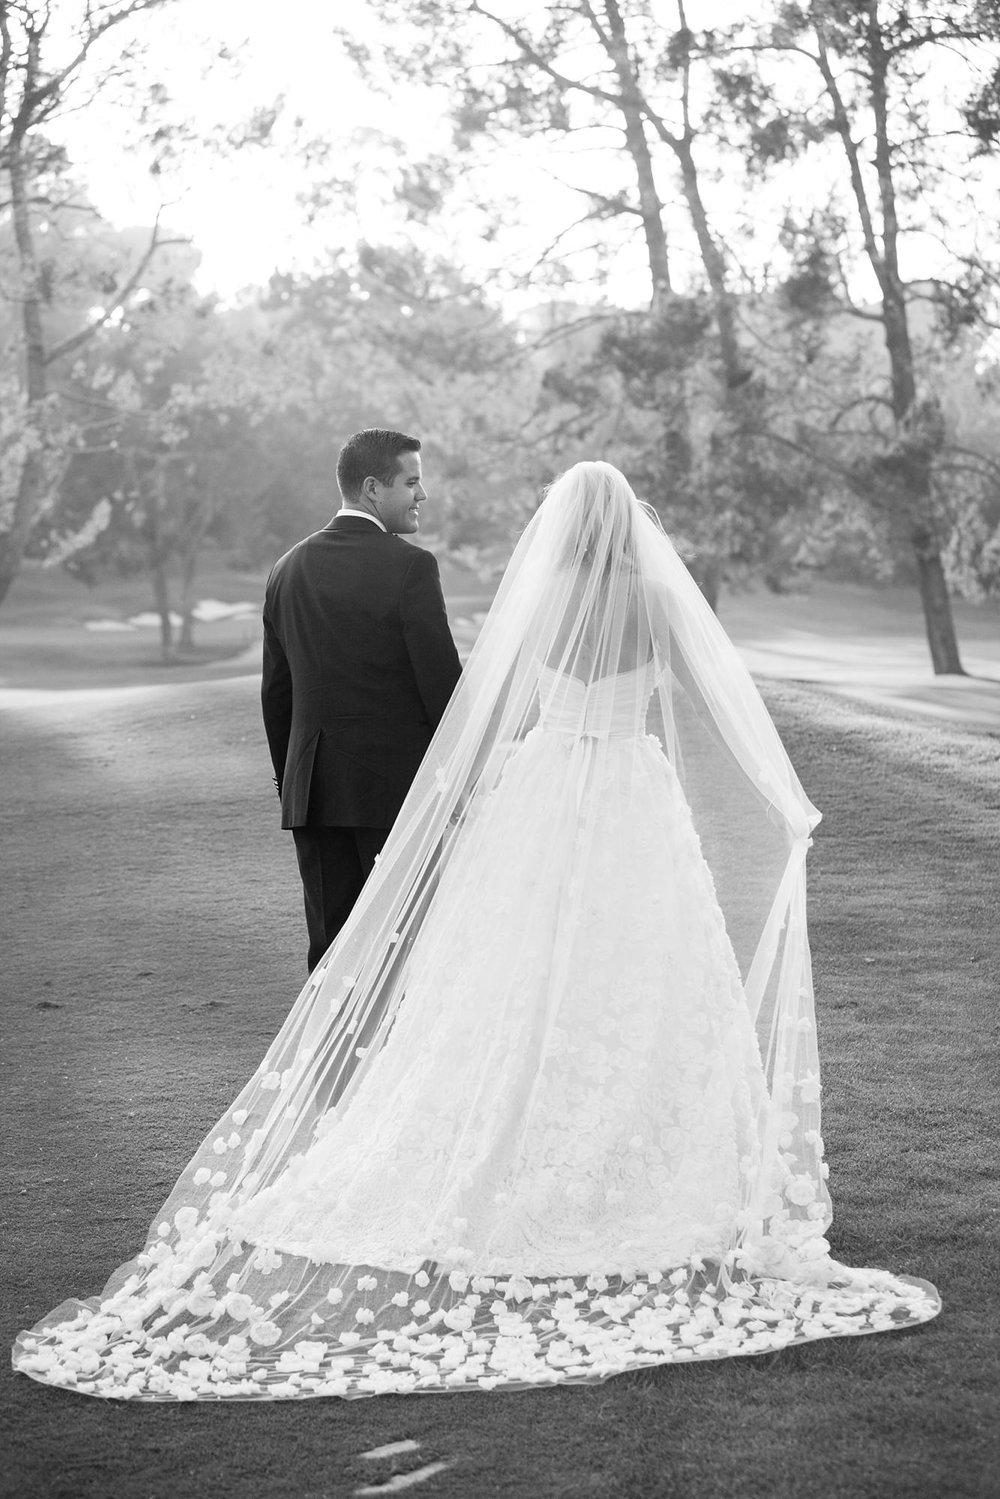 Annandale Golf Club Wedding | Miki & Sonja Photography | mikiandsonja.com